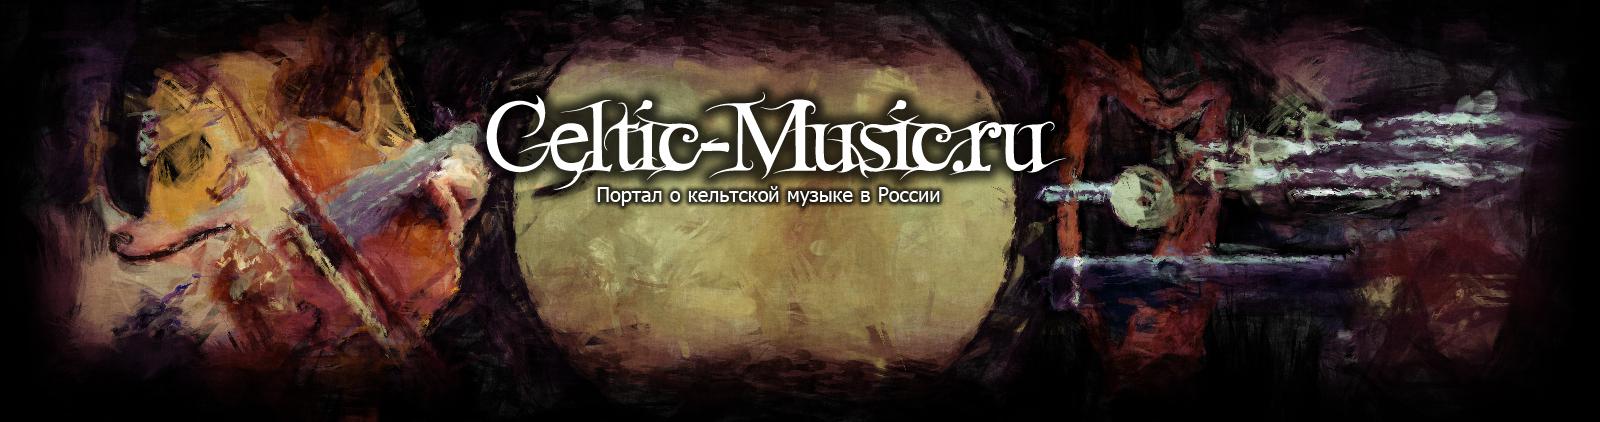 www.celtic-music.ru